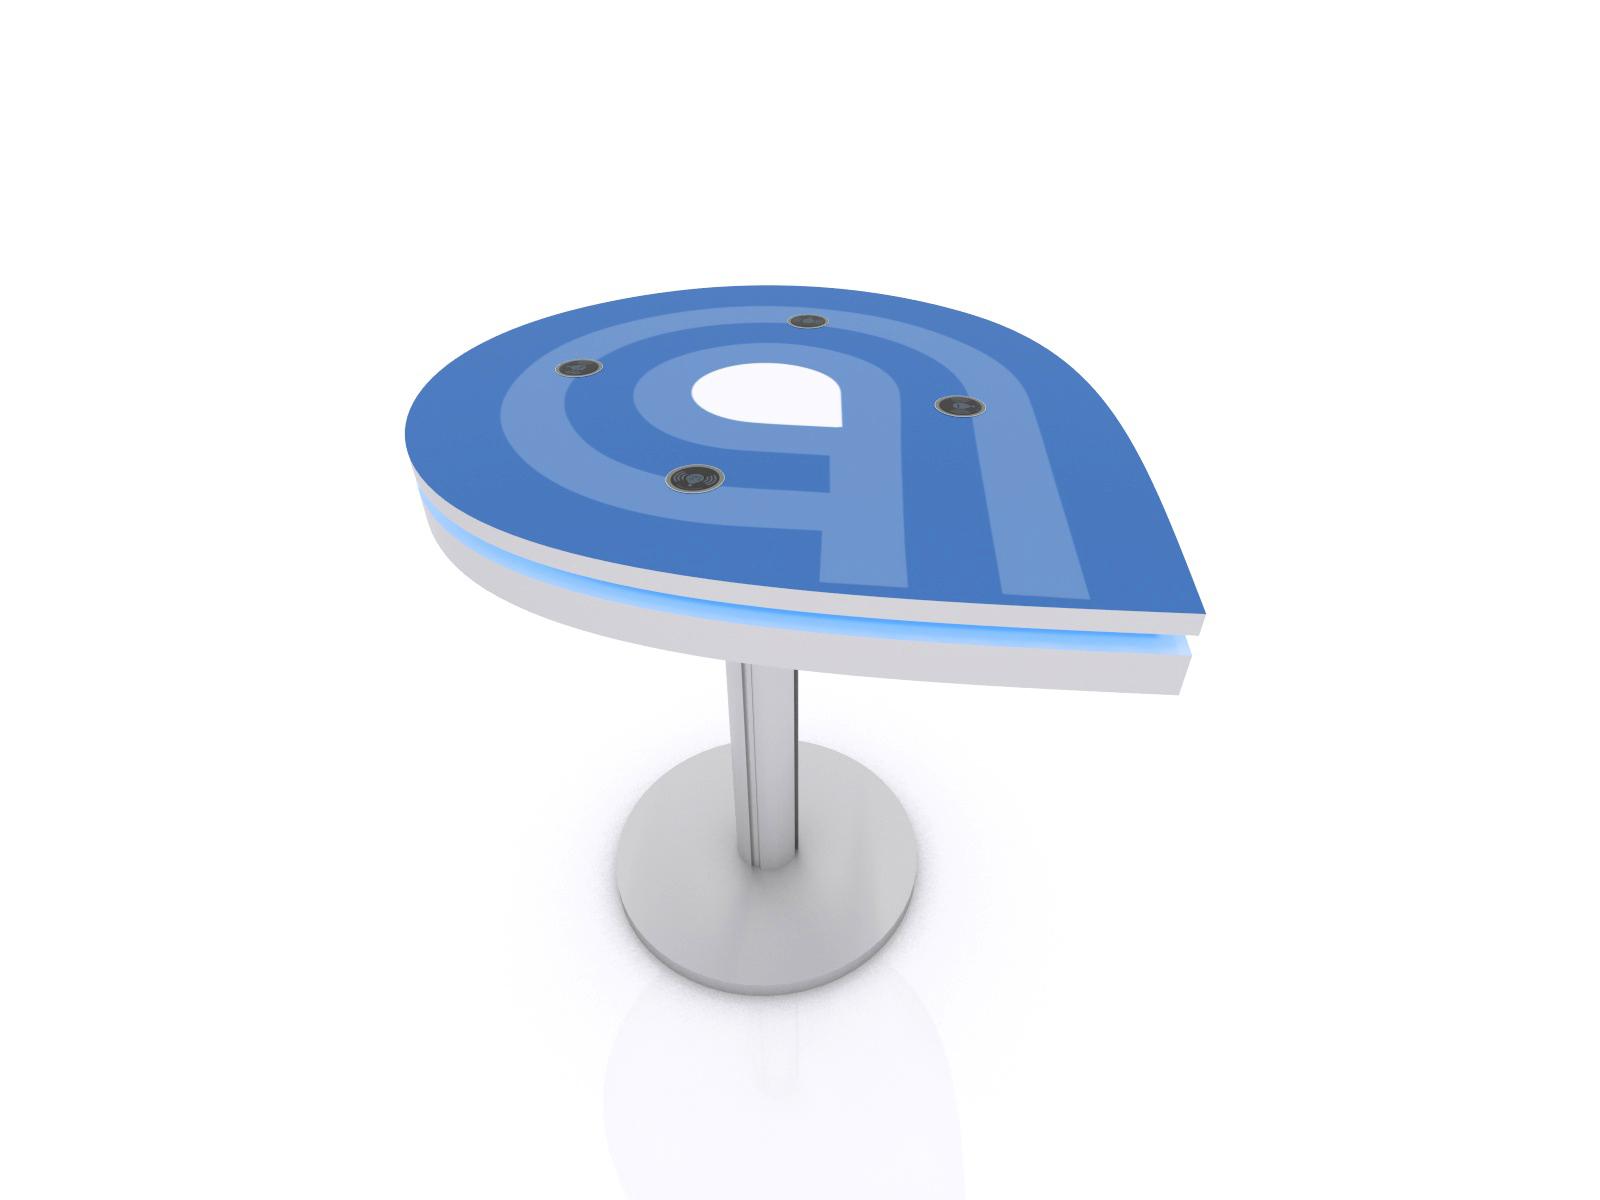 Charging_table_MOD-1457c.jpg